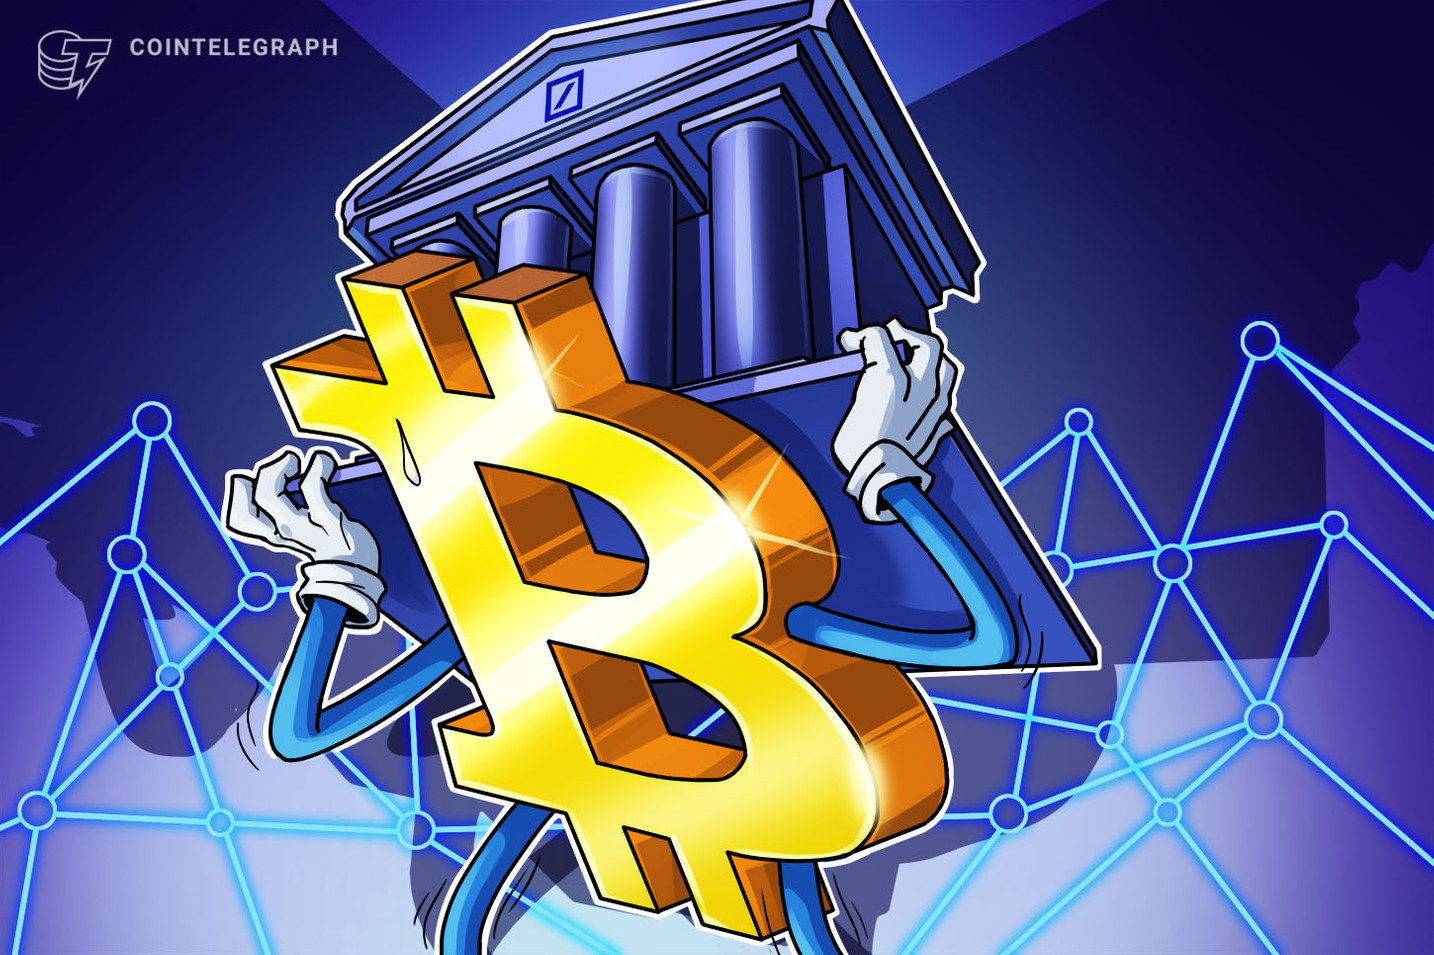 Deutsche Bank: 'Aggressive' Central Banks Making Bitcoin More Attractive